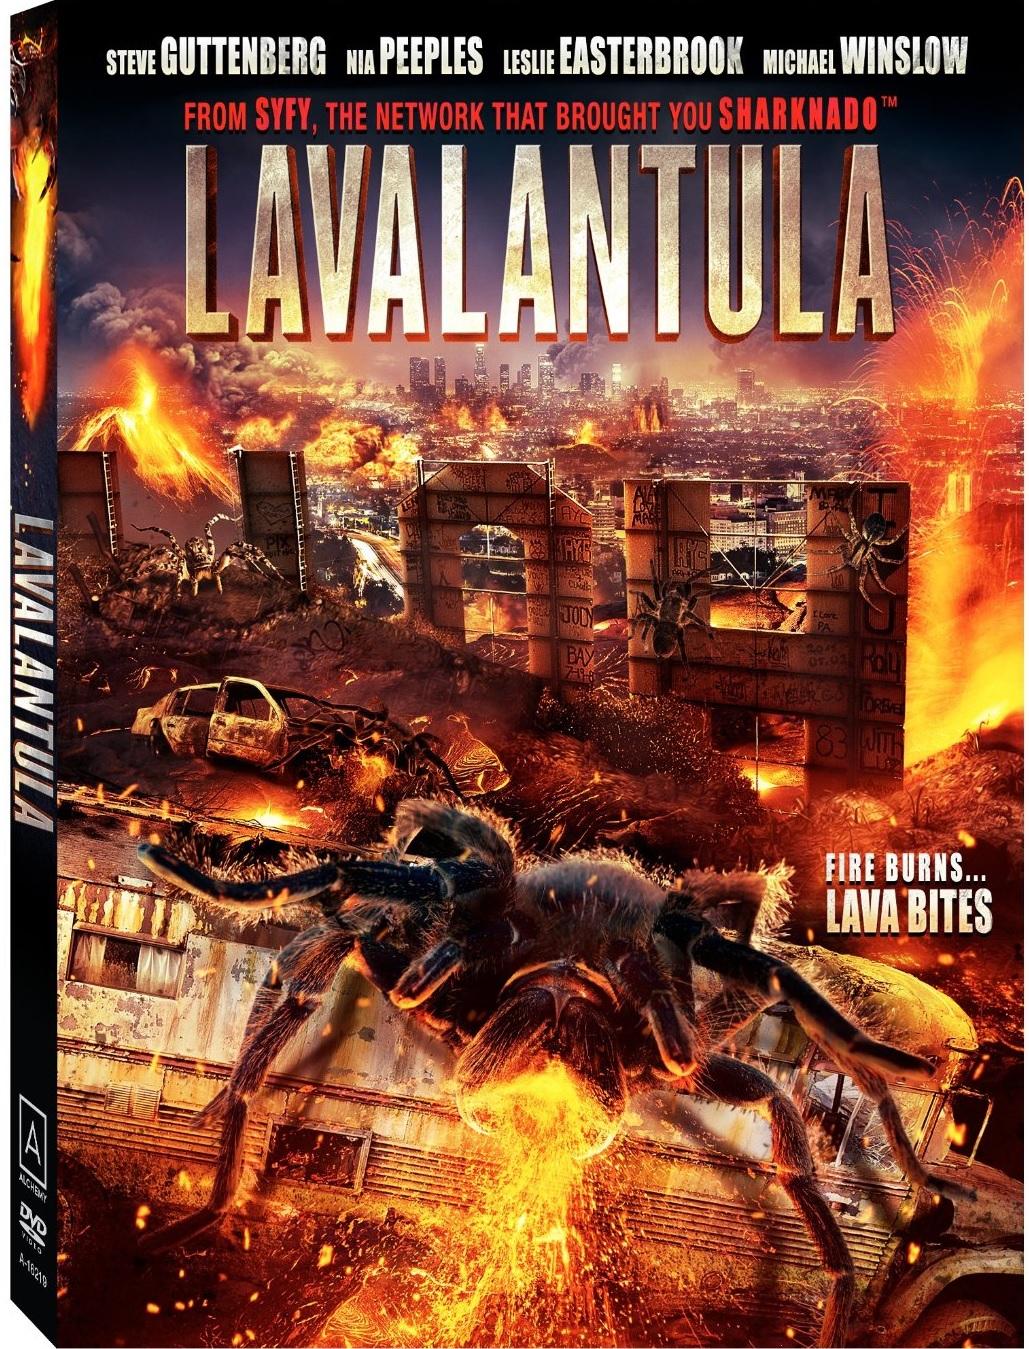 lavalantula DVD Review